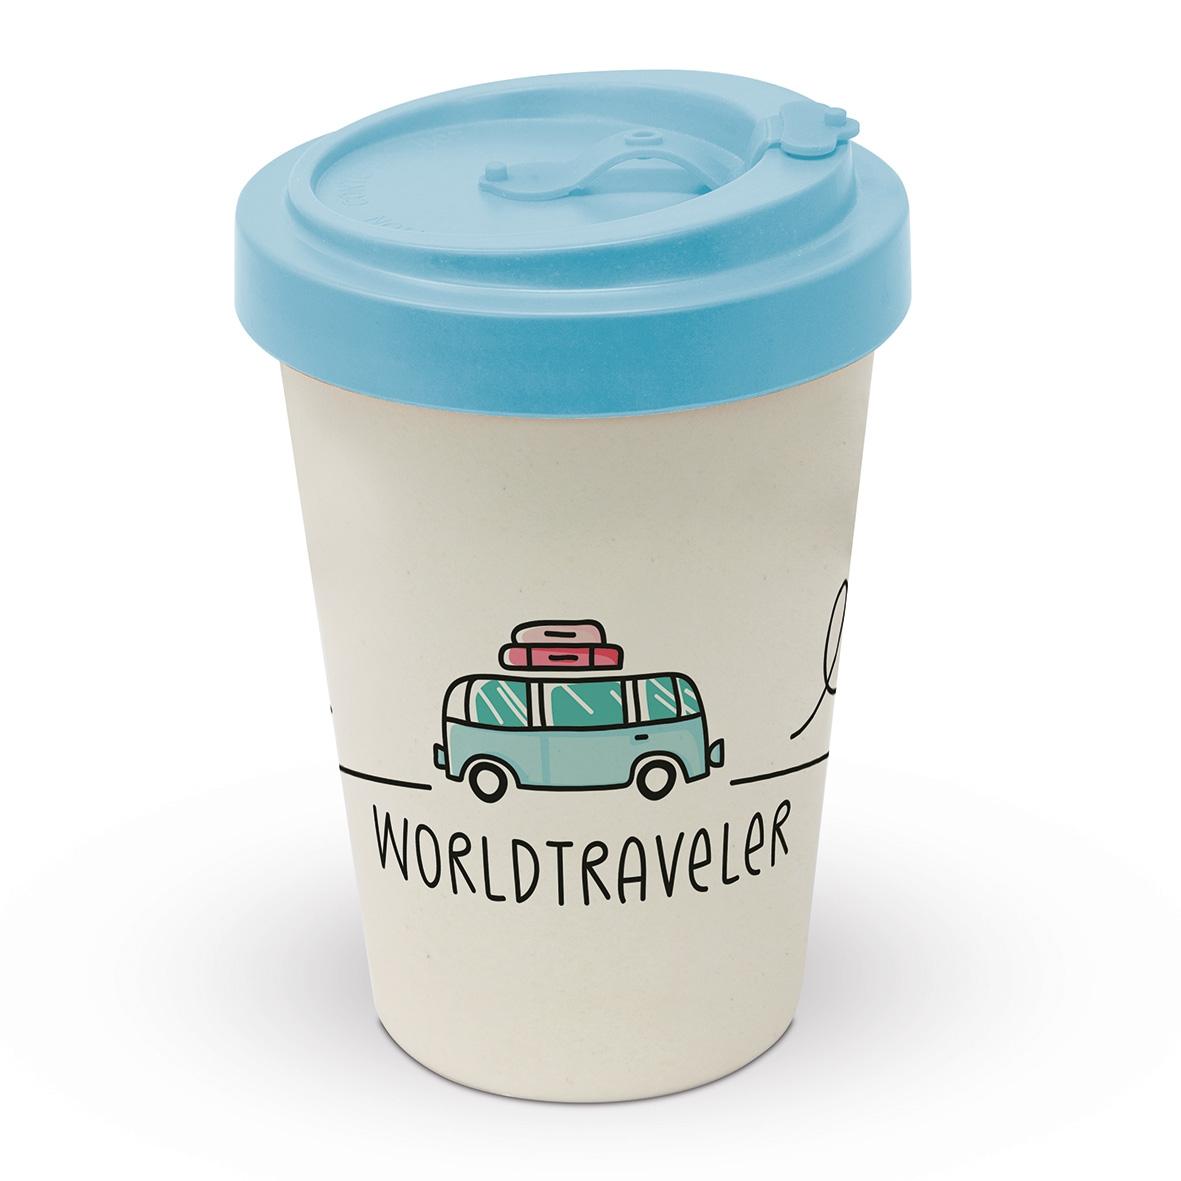 Bamboo mug To-Go - Worldtraveler